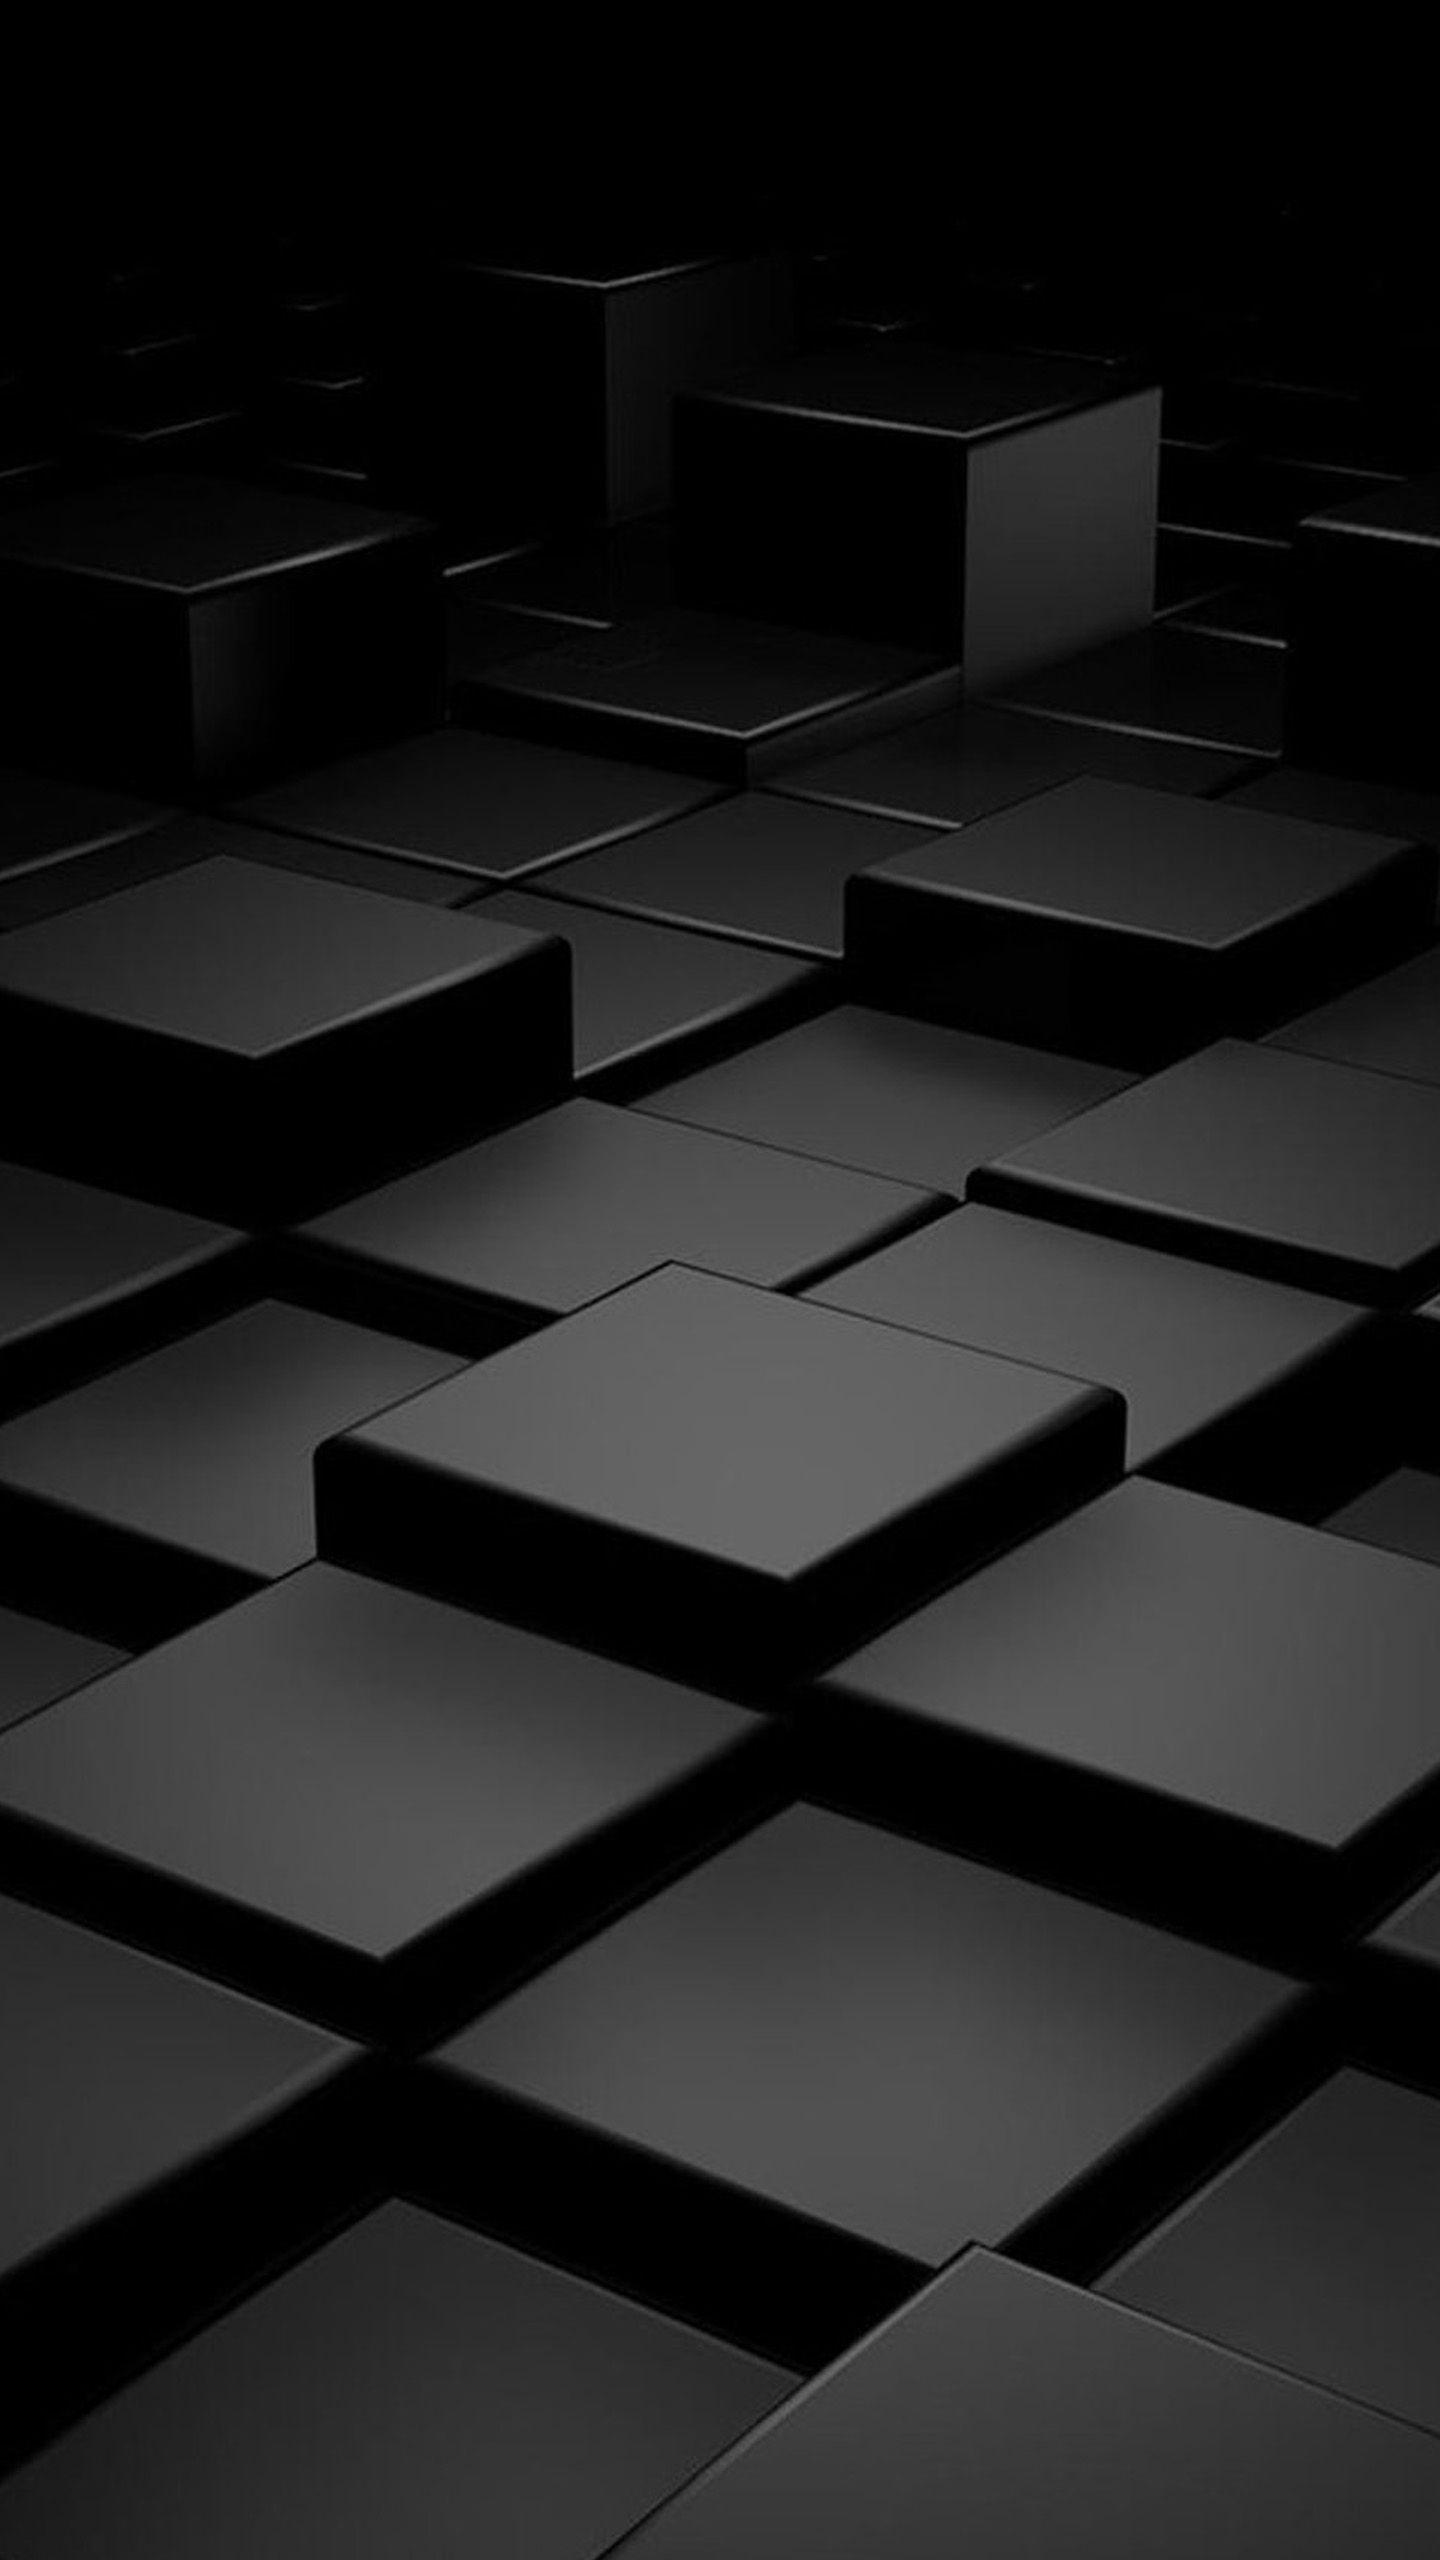 Samsung Galaxy Black Wallpapers On Wallpaperdog